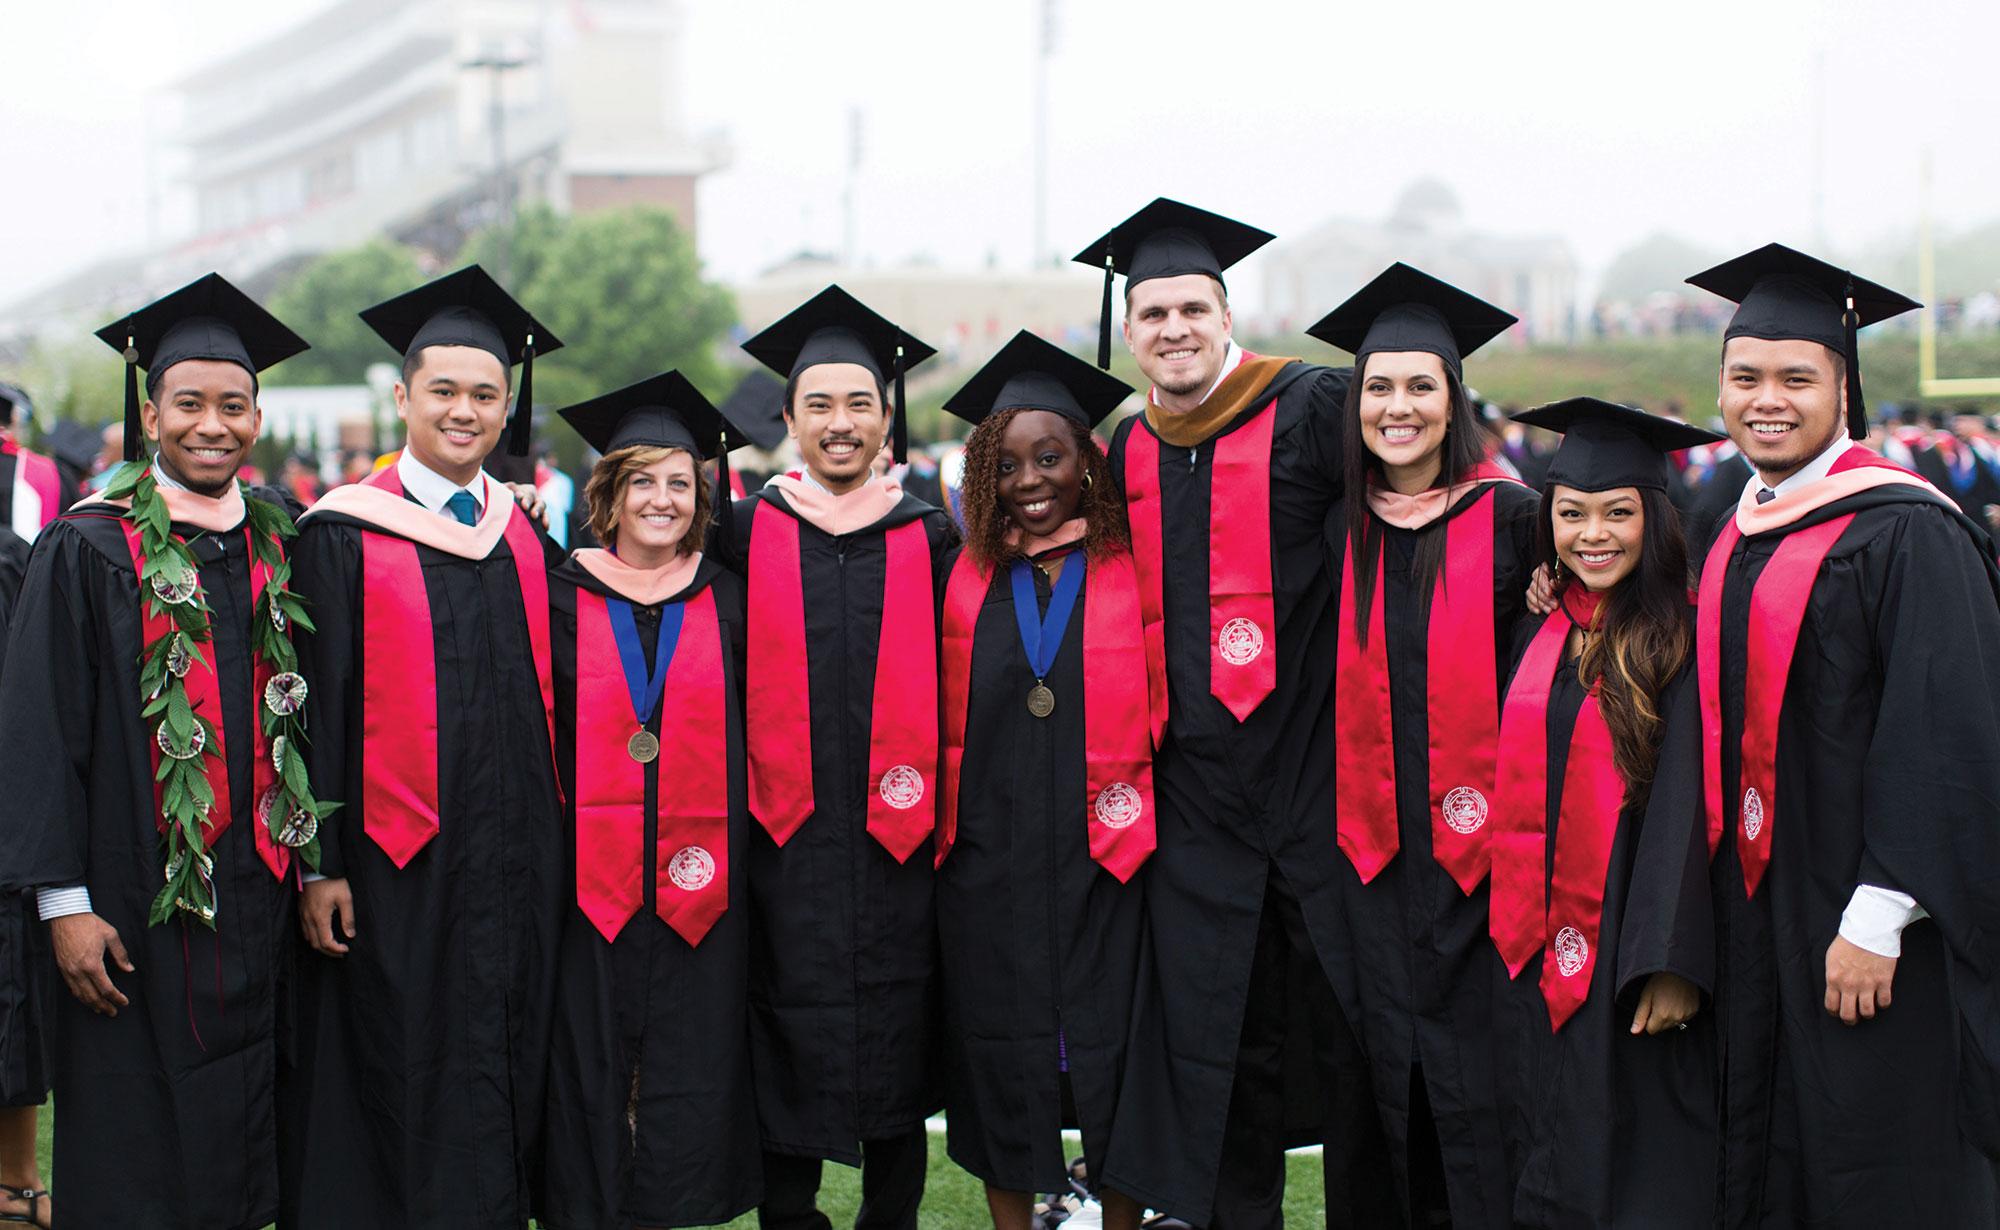 Members of Liberty University's Class of 2015.